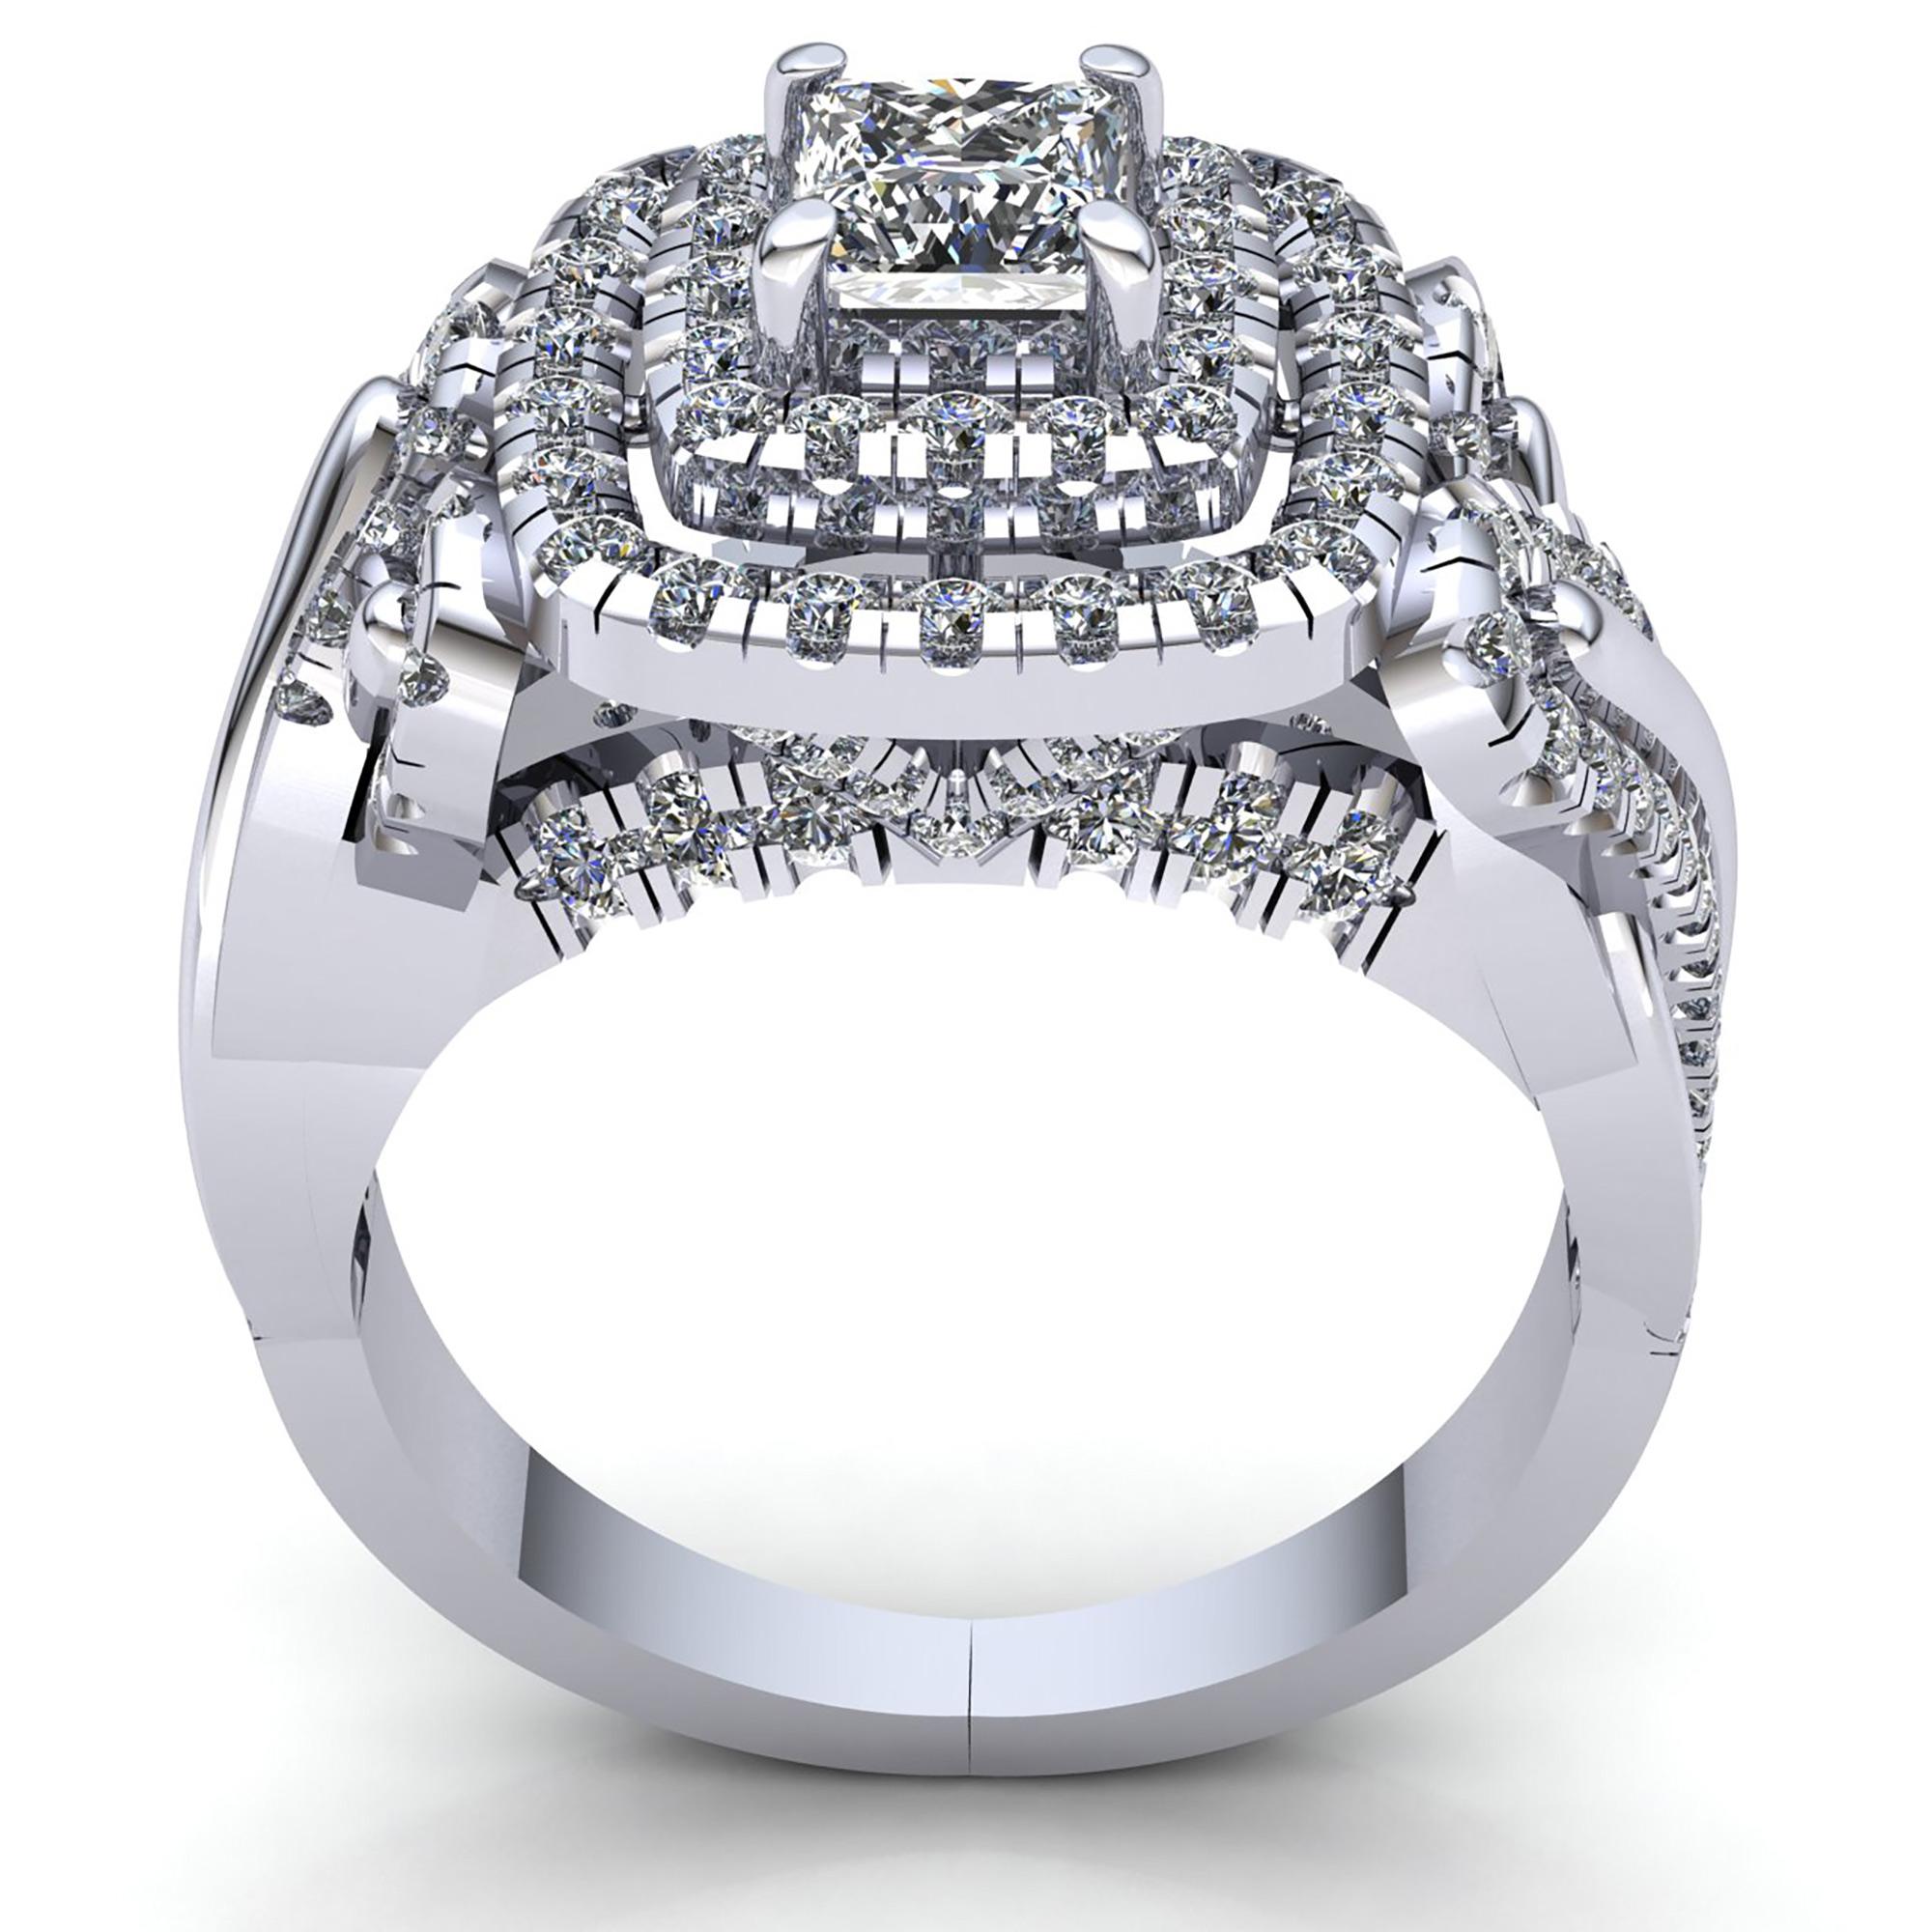 Natural-3-Quilates-Diamante-Talla-Princesa-Mujer-Doble-Halo-Anillo-de-Compromiso miniatura 11